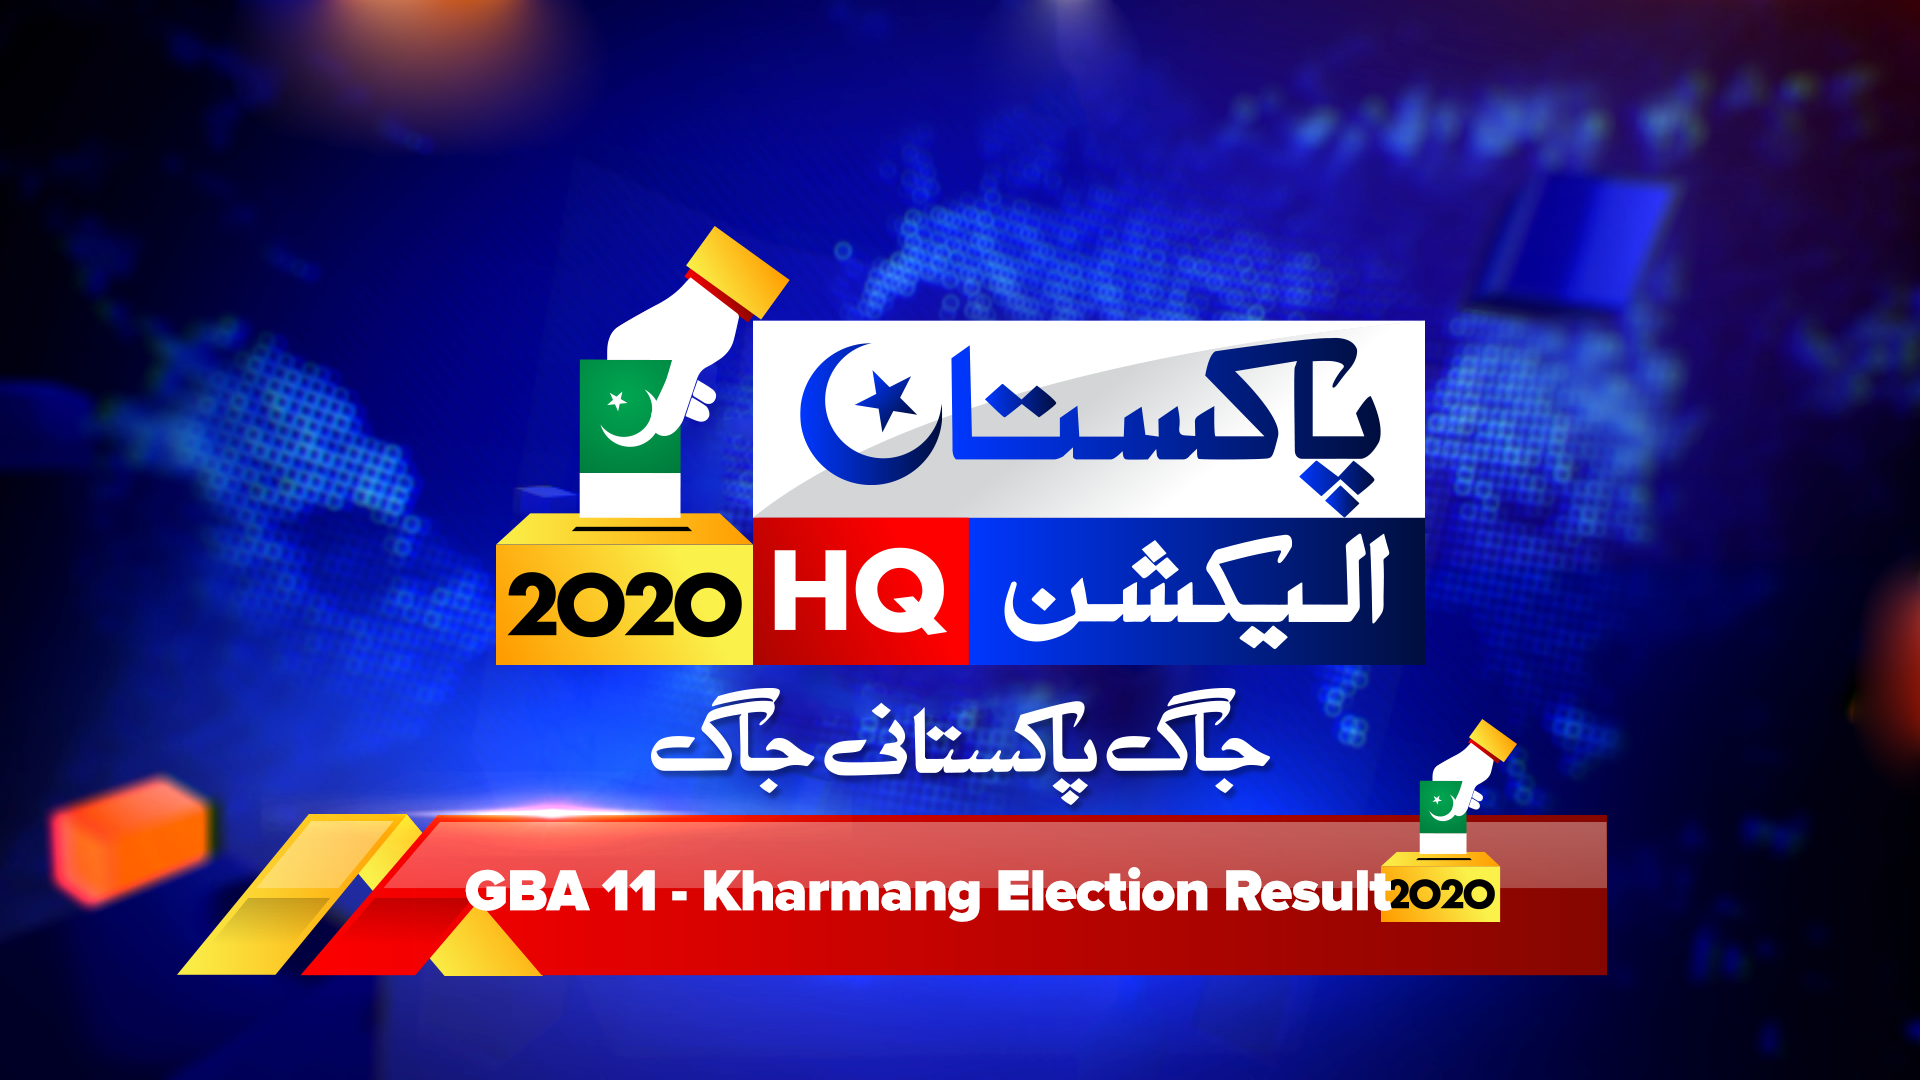 GBA 11 Gilgit 11 Election Result